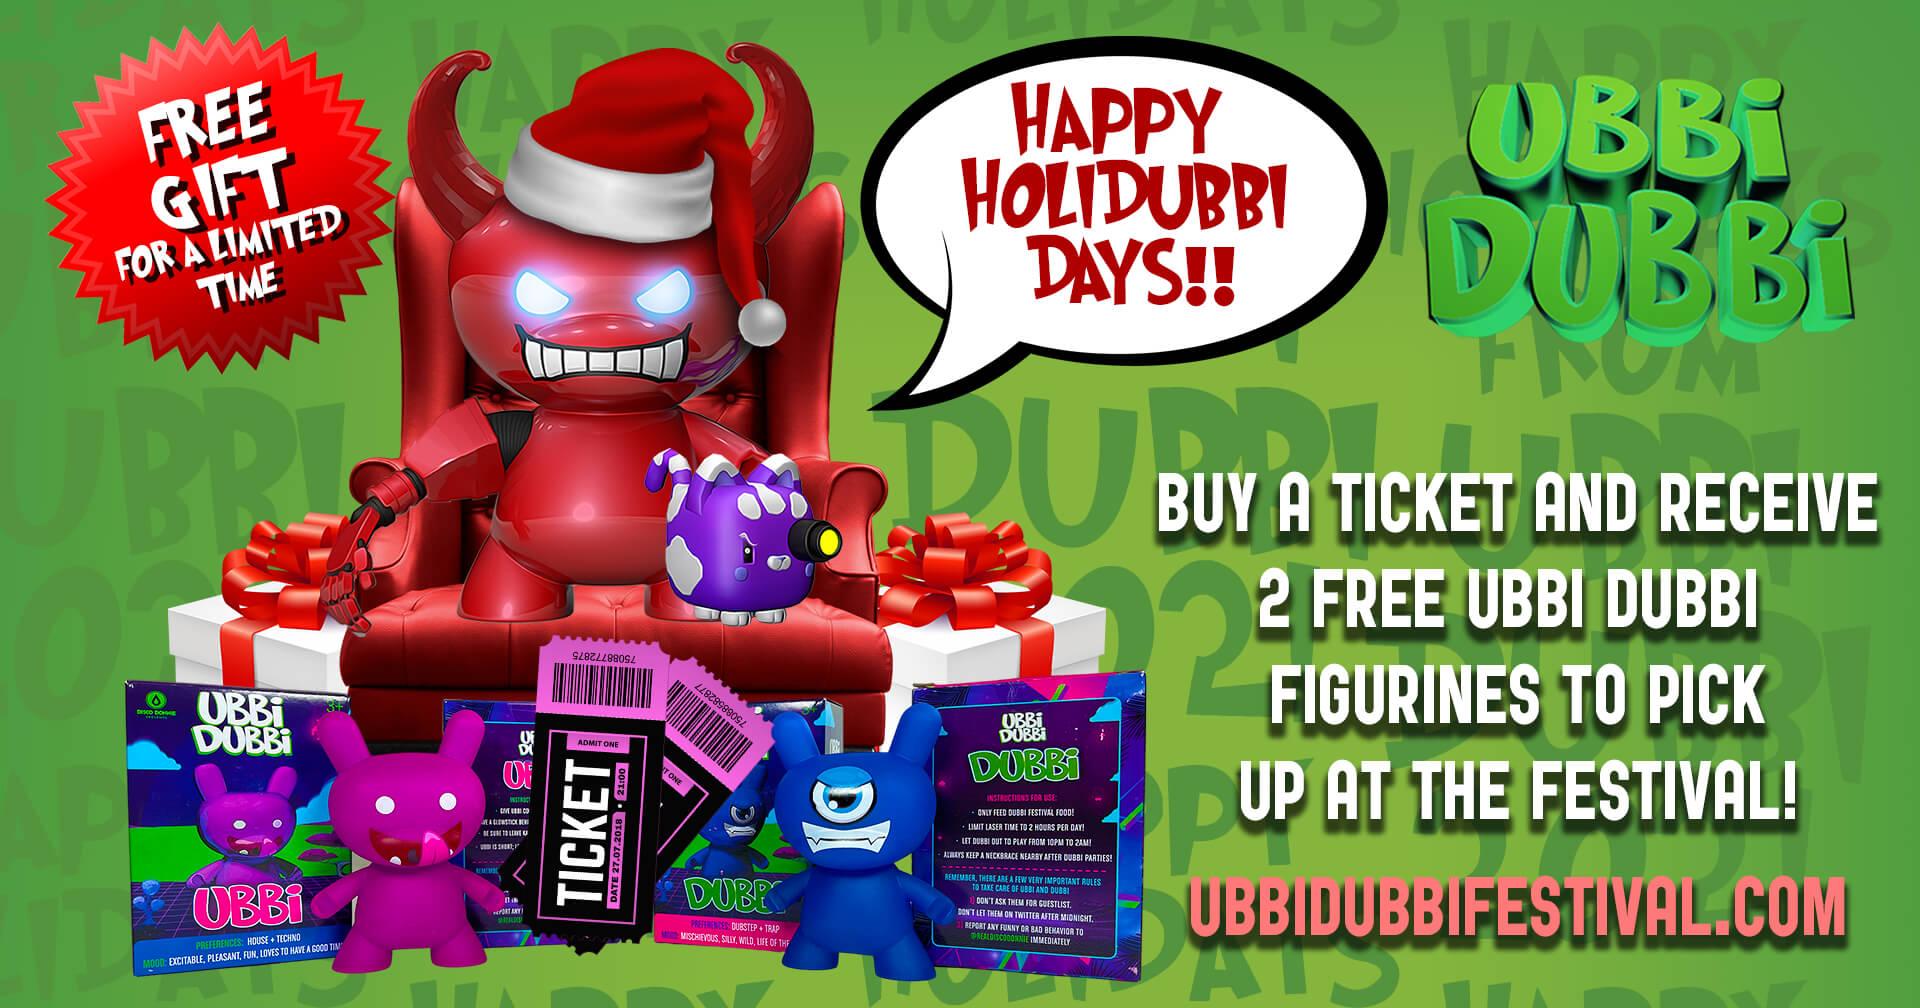 Receive Ubbi Dubbi Figurines with Ticket Purchase!